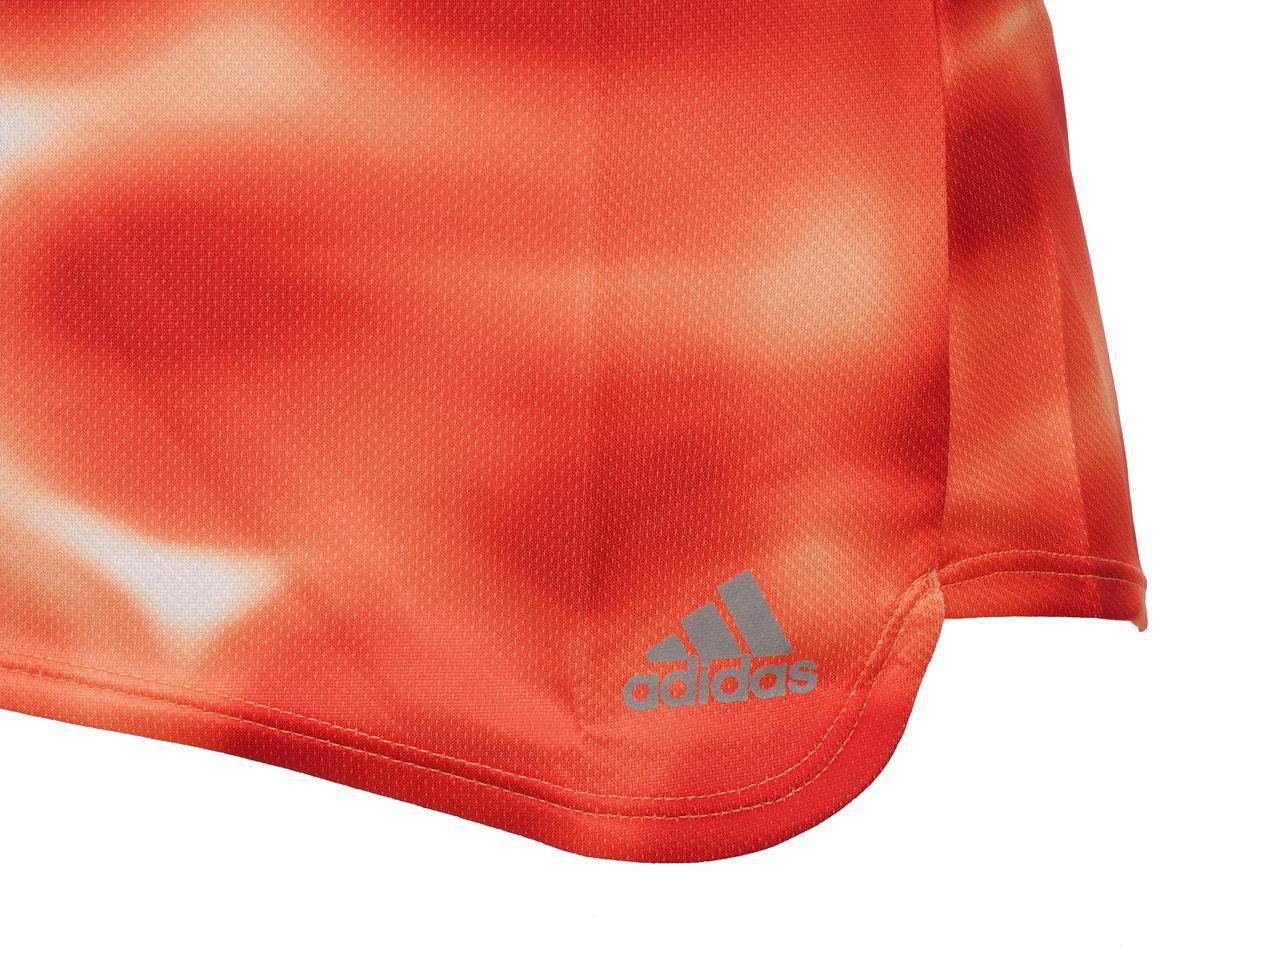 MAILLOT DE RUNNING Adidas Rs q1 ss tee org Orange 76948